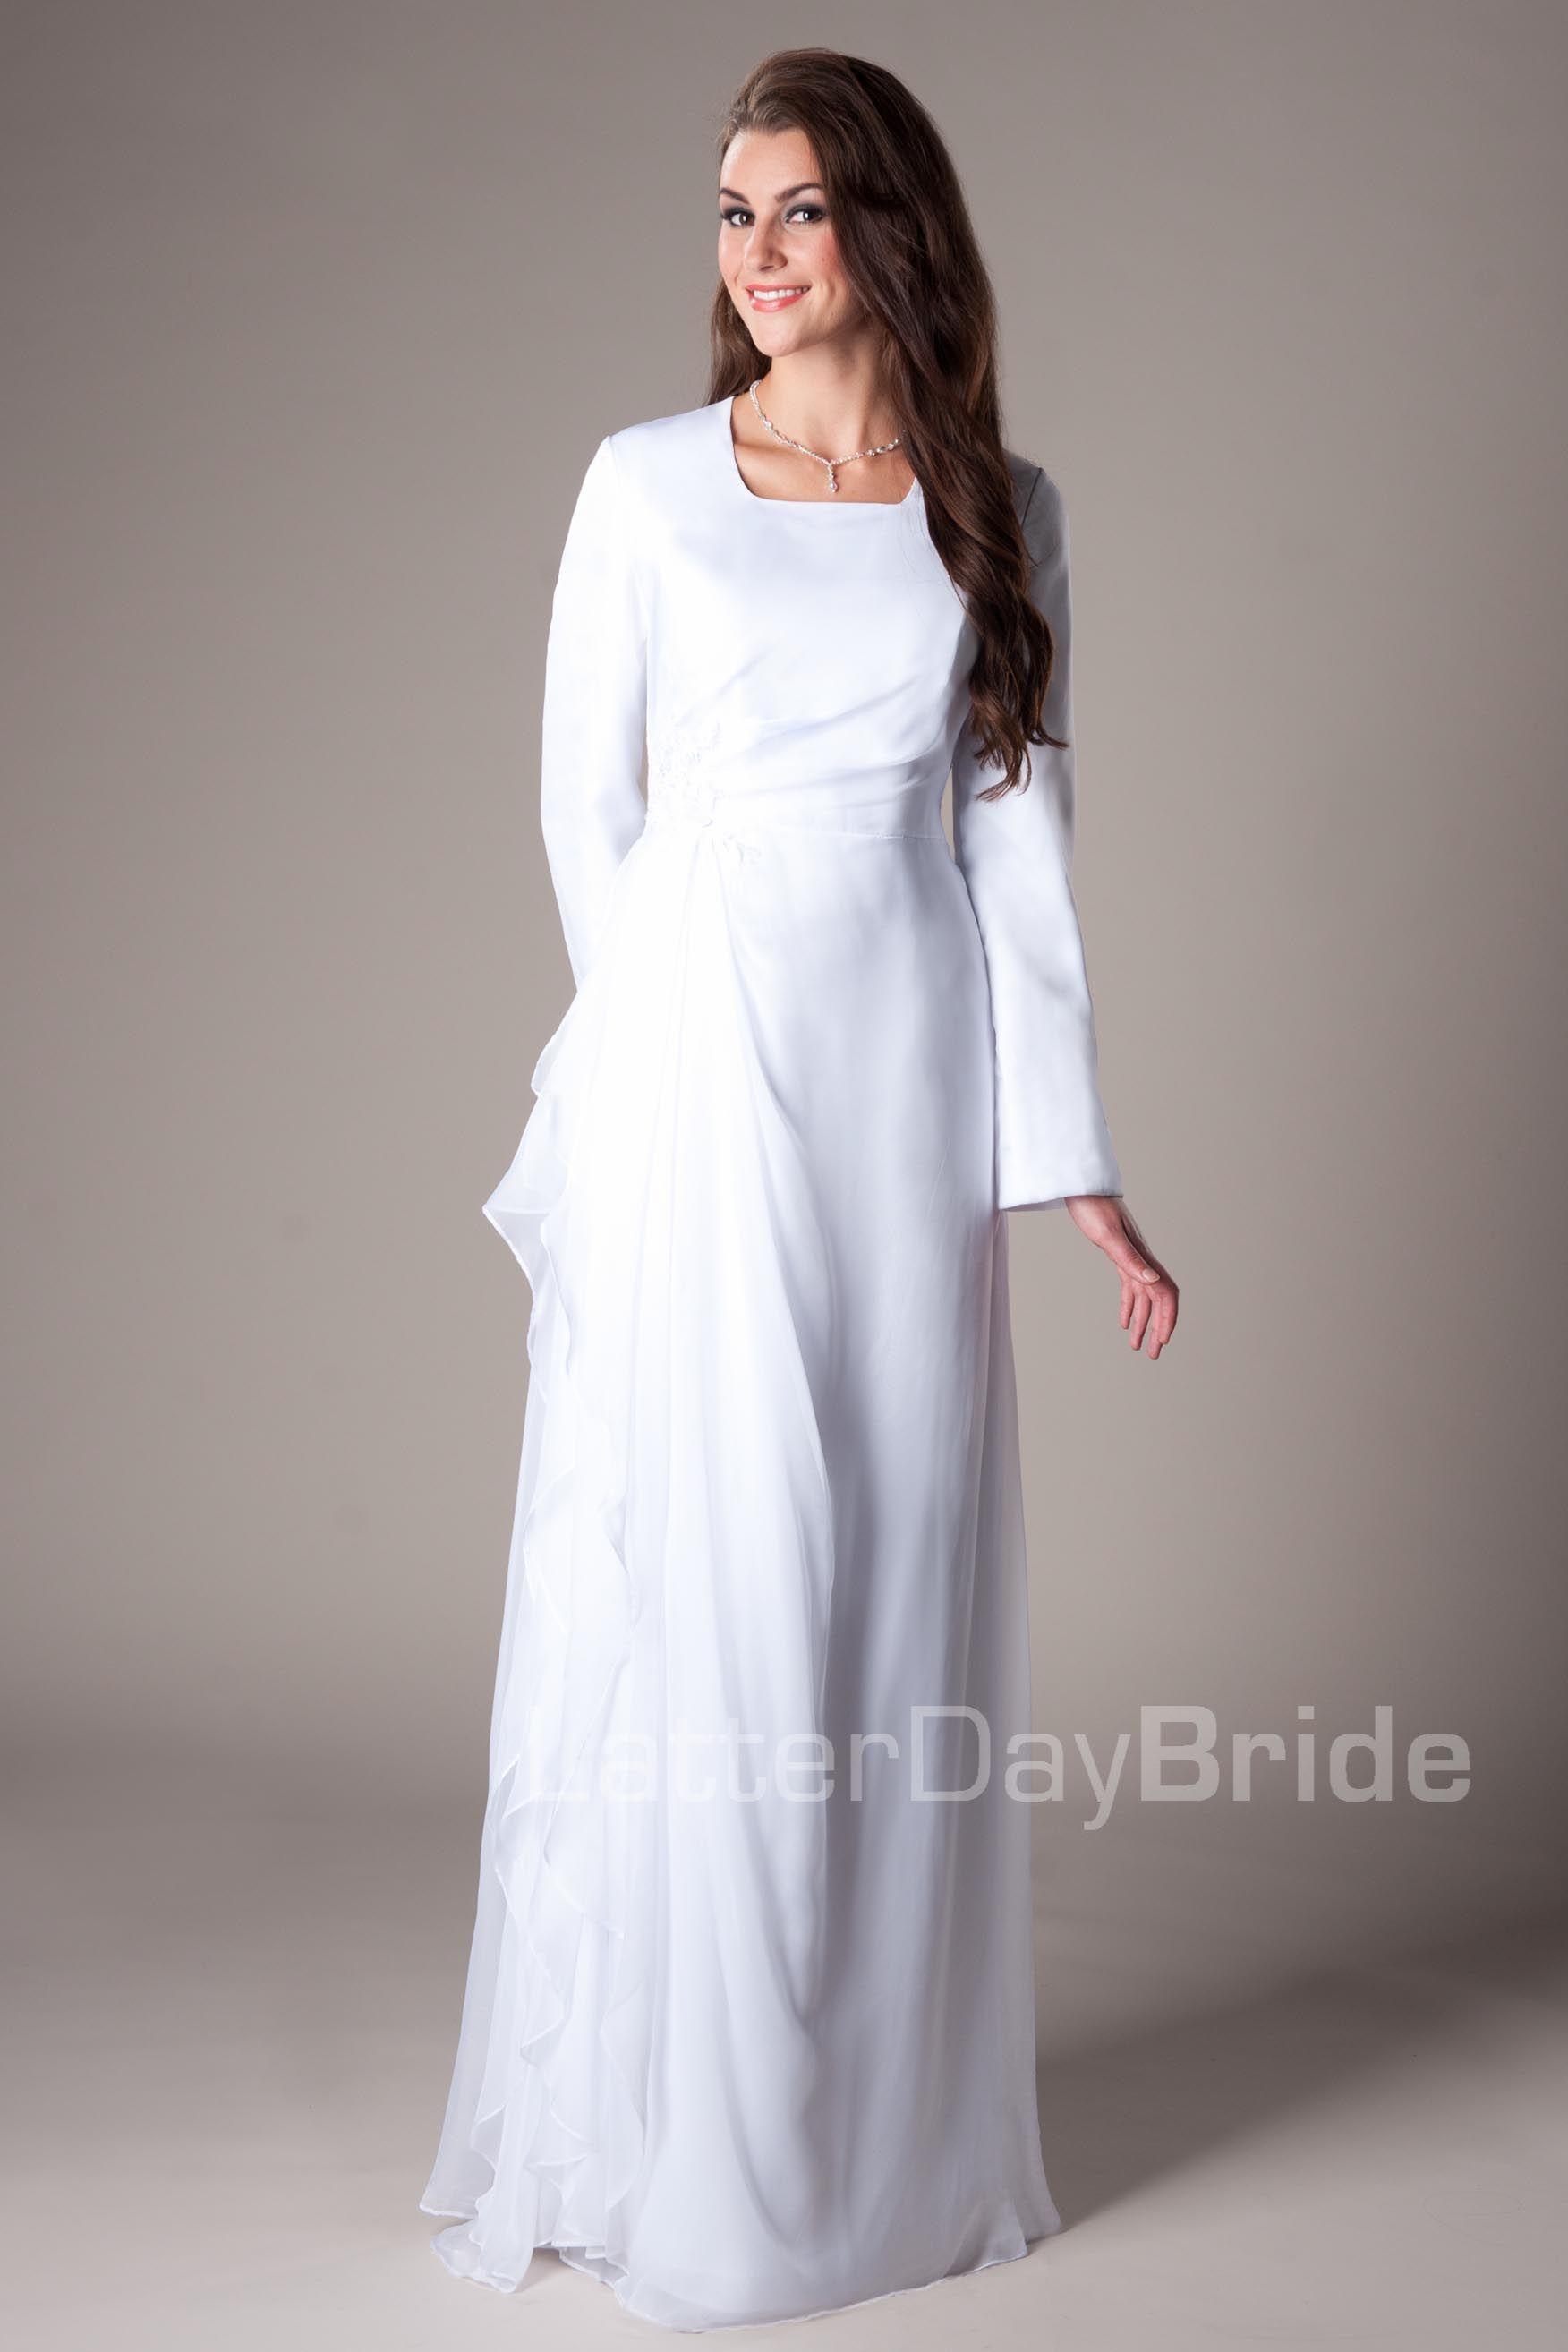 Cheap modest wedding dresses  Provo temple dress  Wedding  Pinterest  Temple dress Dresses and